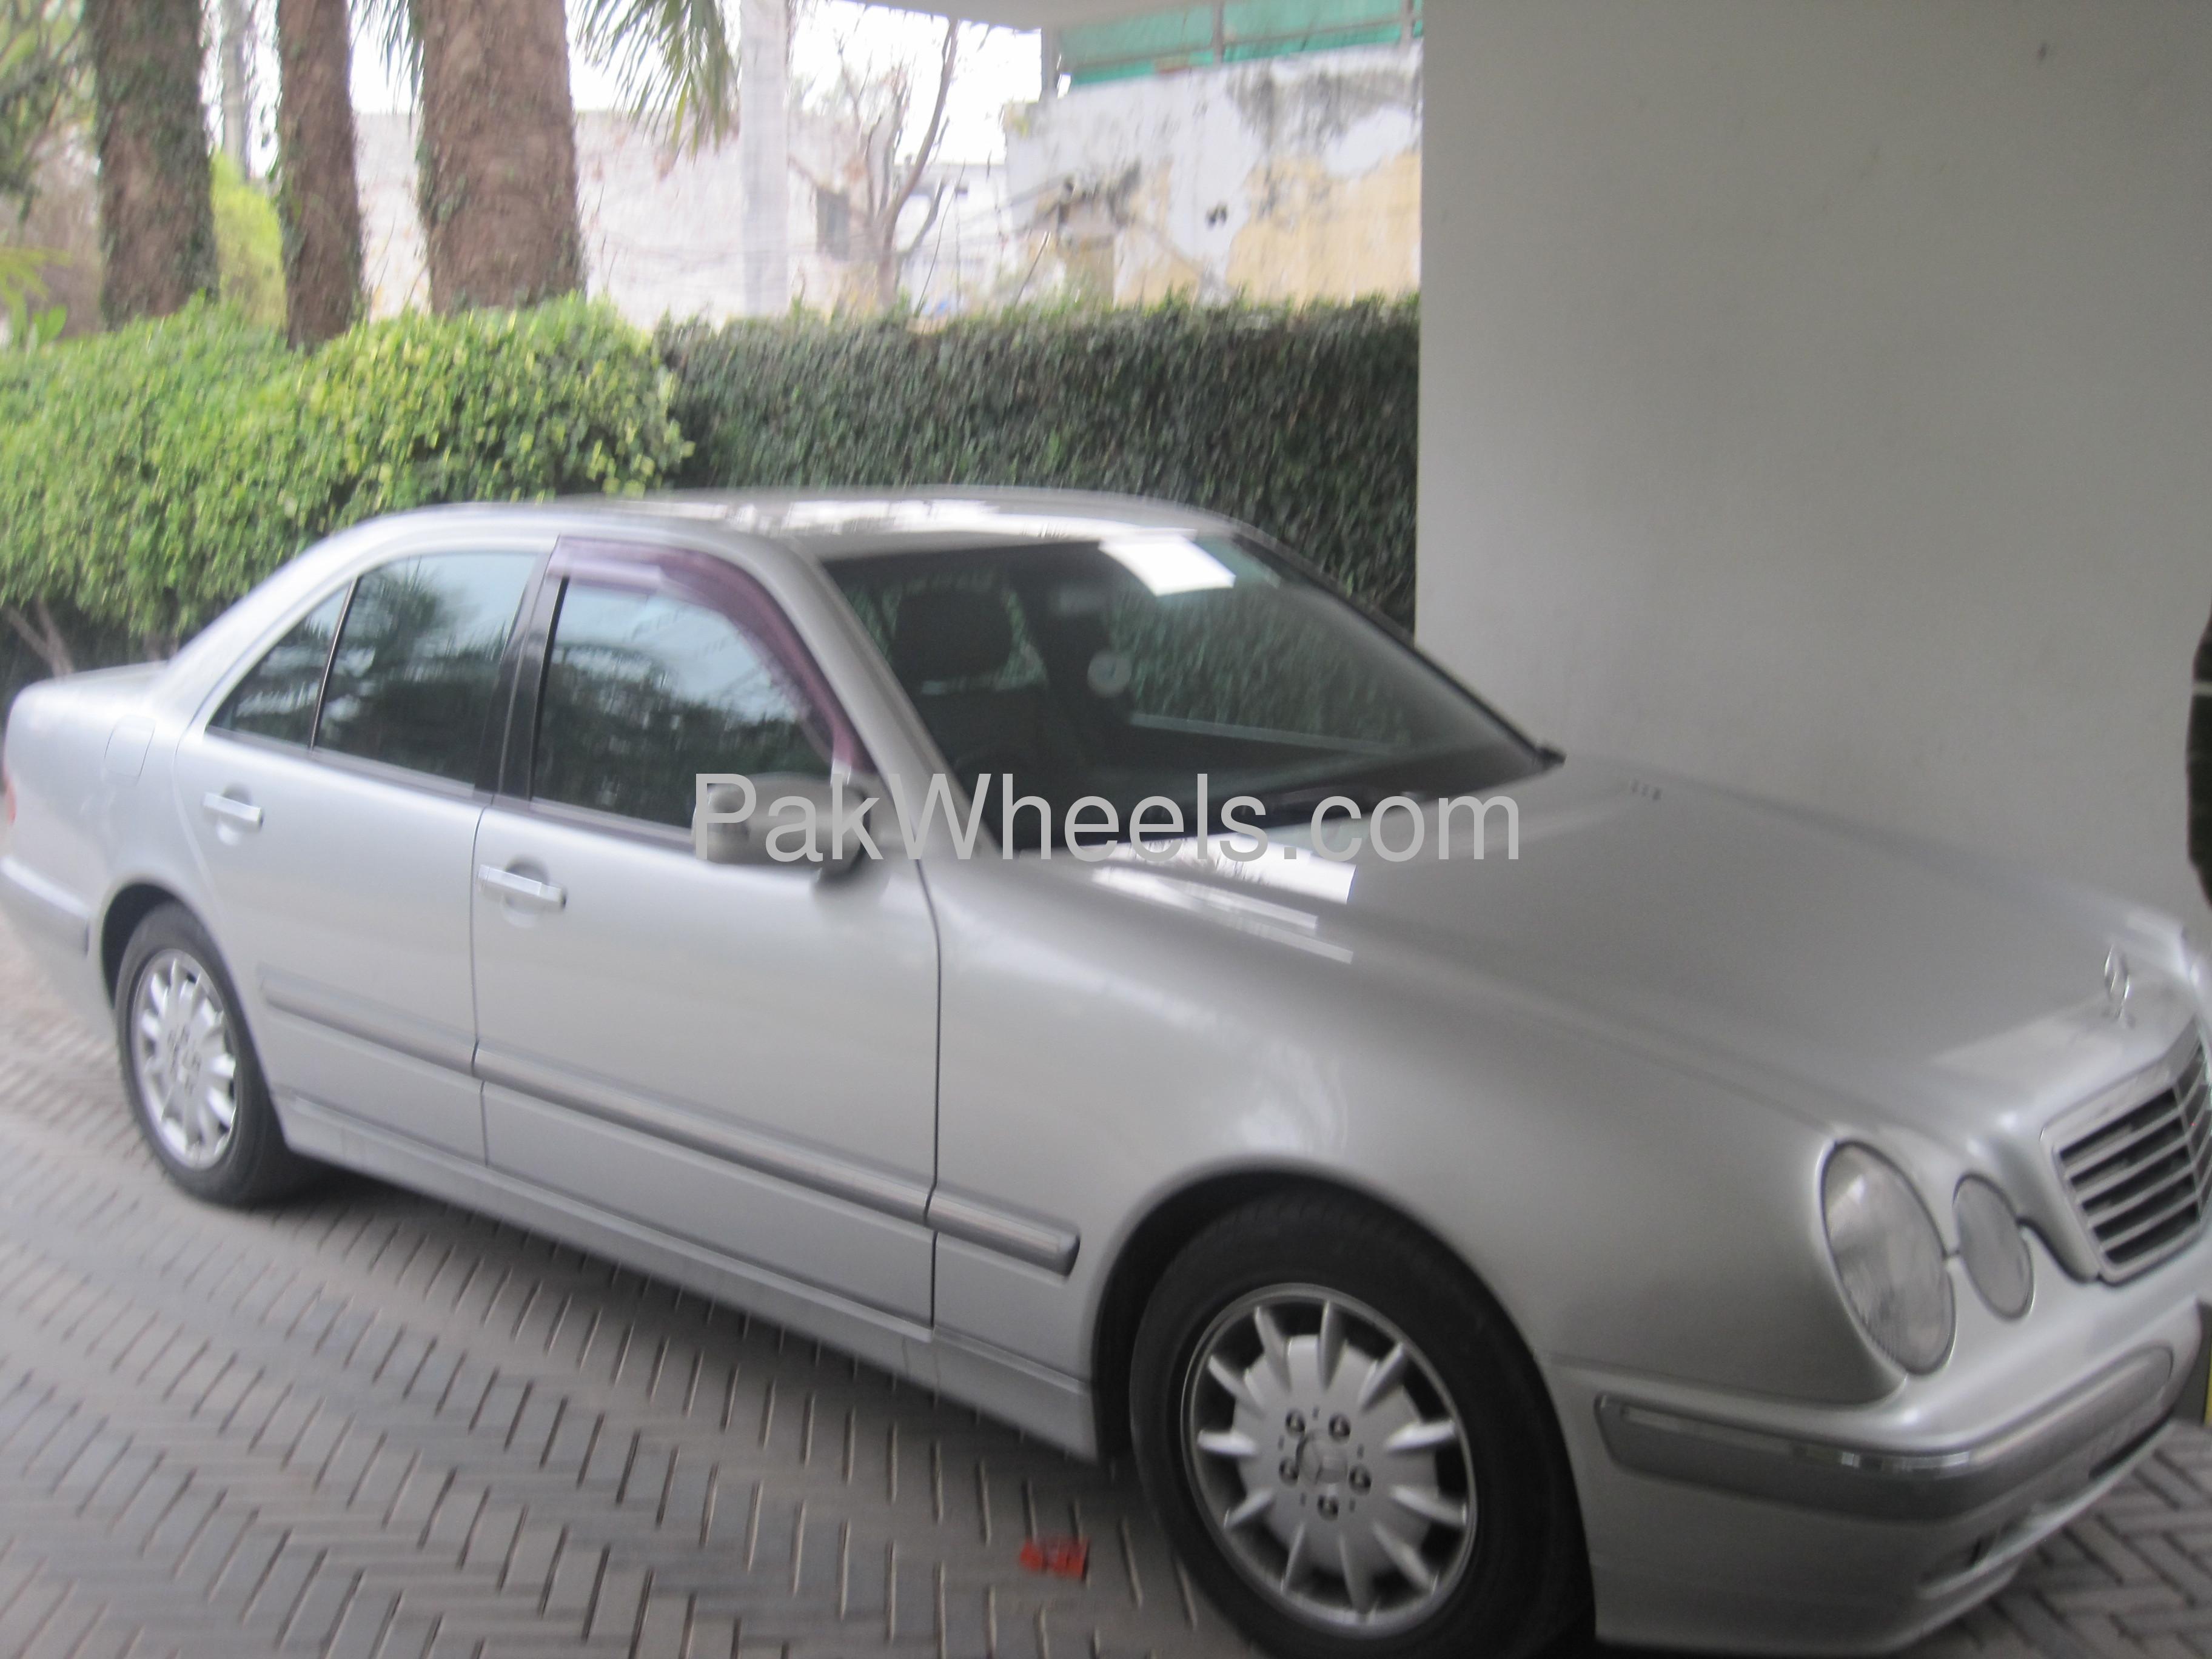 Mercedes benz e class e250 2000 for sale in lahore pakwheels for 2000 mercedes benz e class